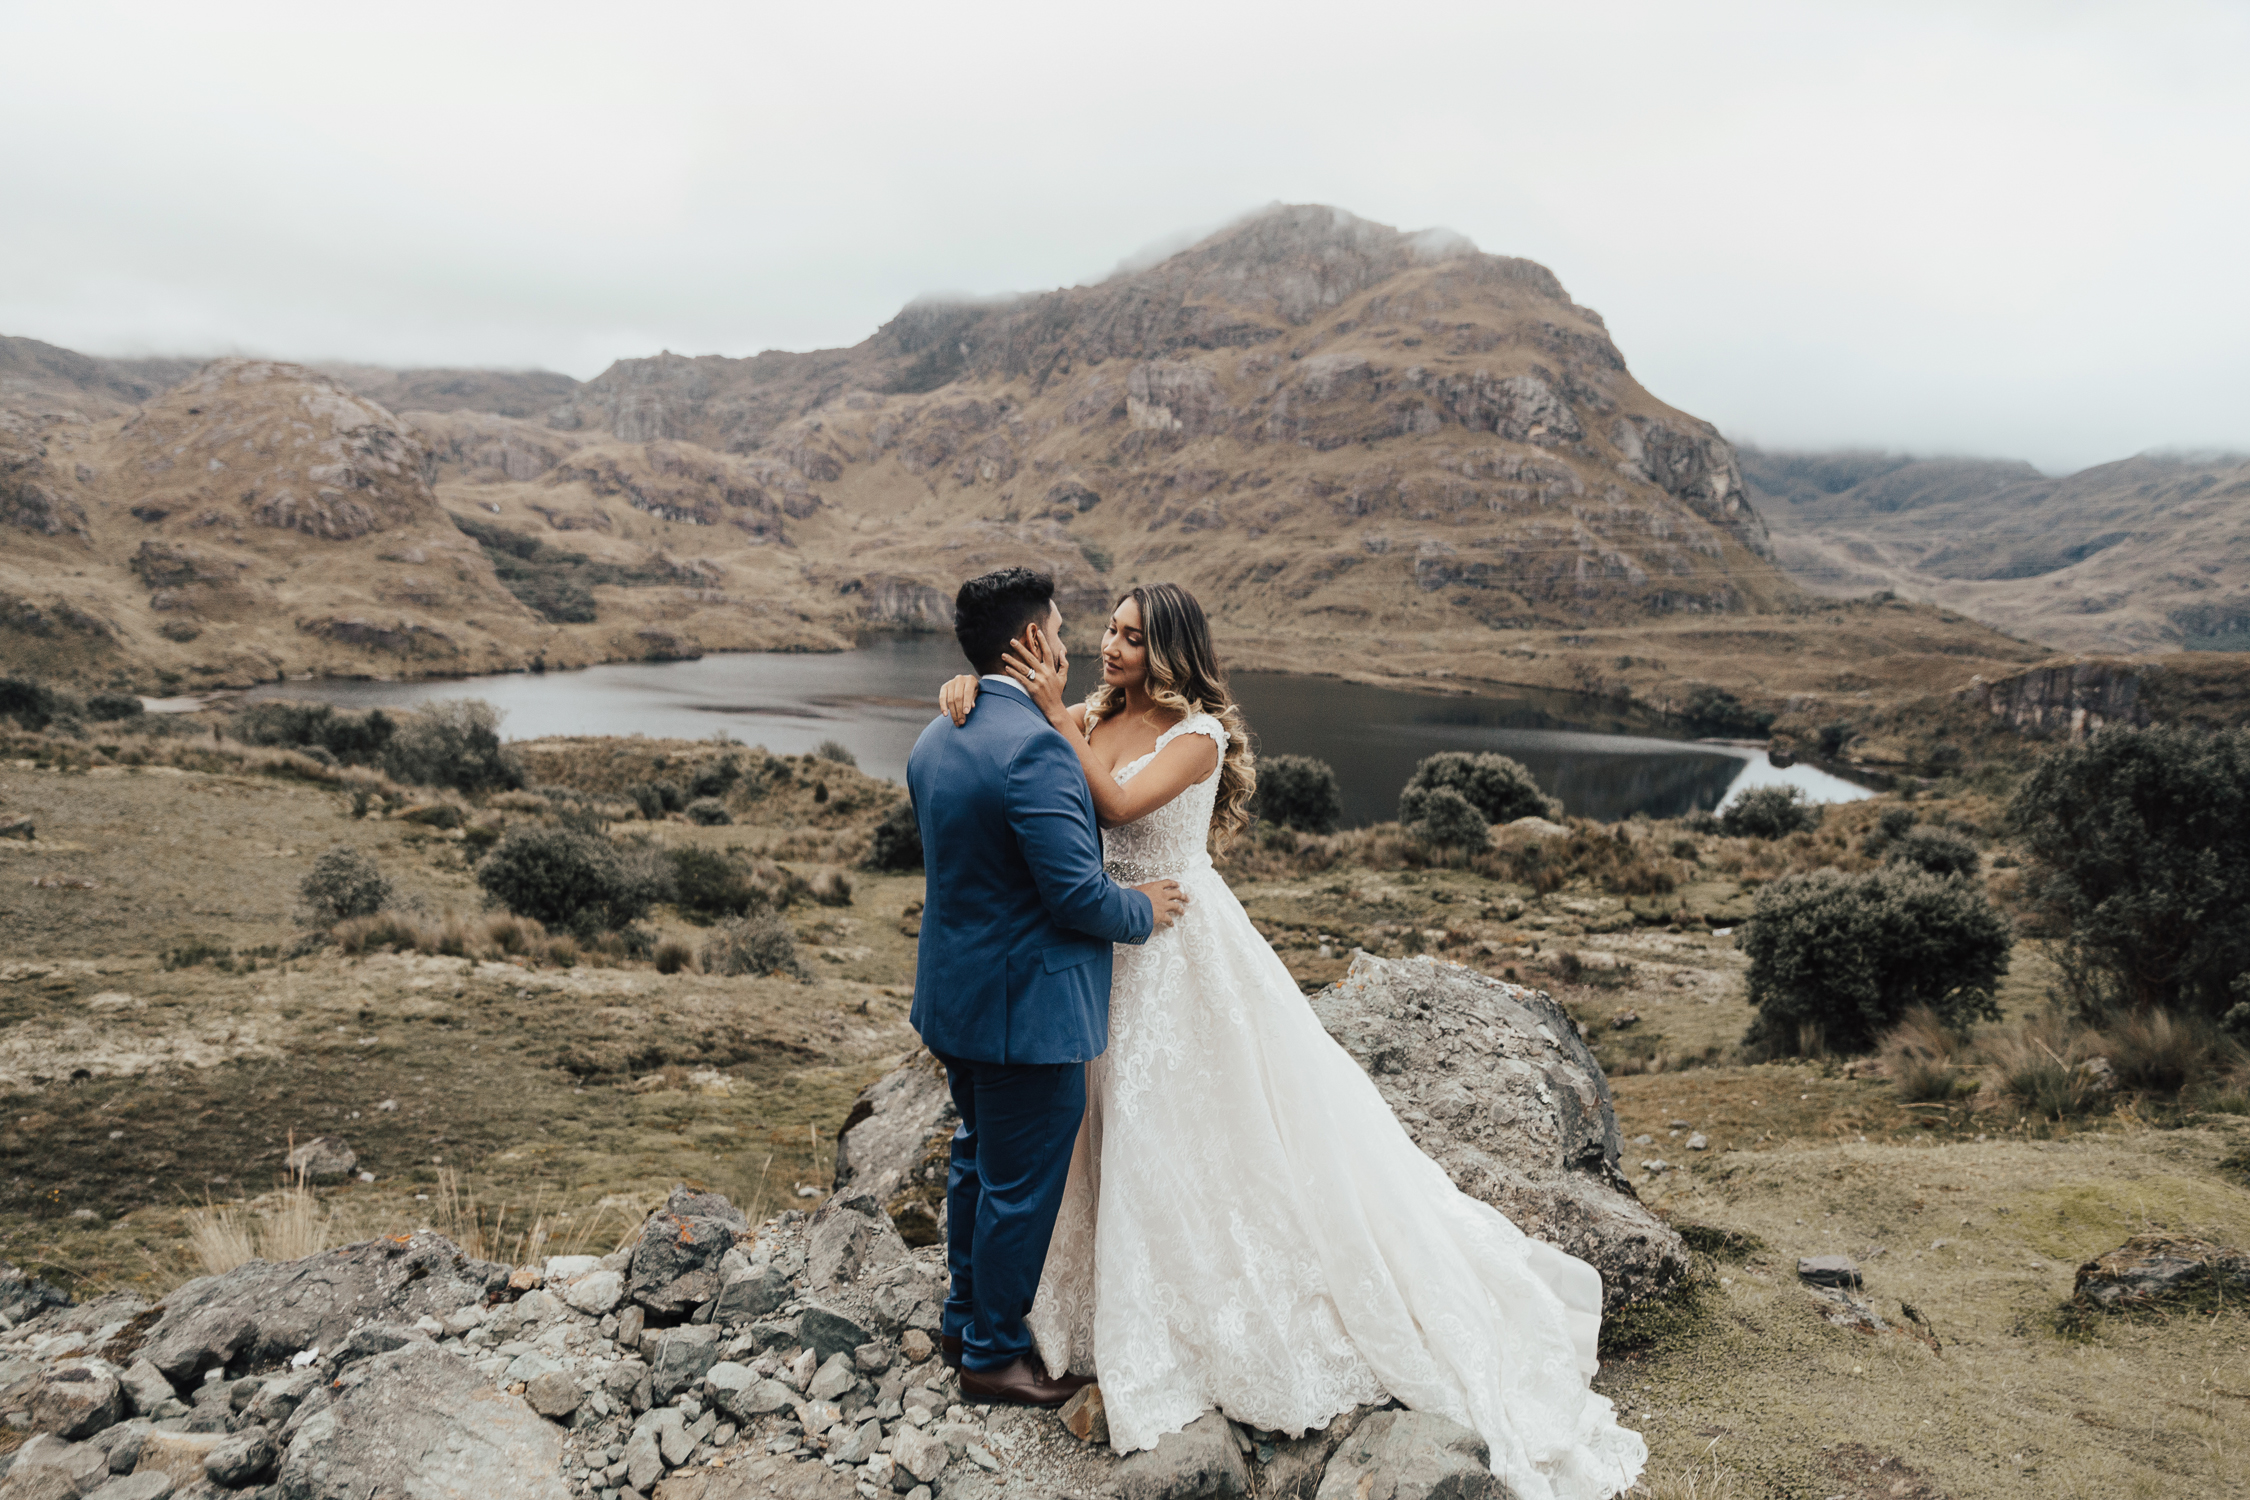 Michelle-Agurto-Fotografia-Bodas-Destination-Wedding-Photographer-Ecuador-Sesion-Johanna-Eduardo-76.JPG